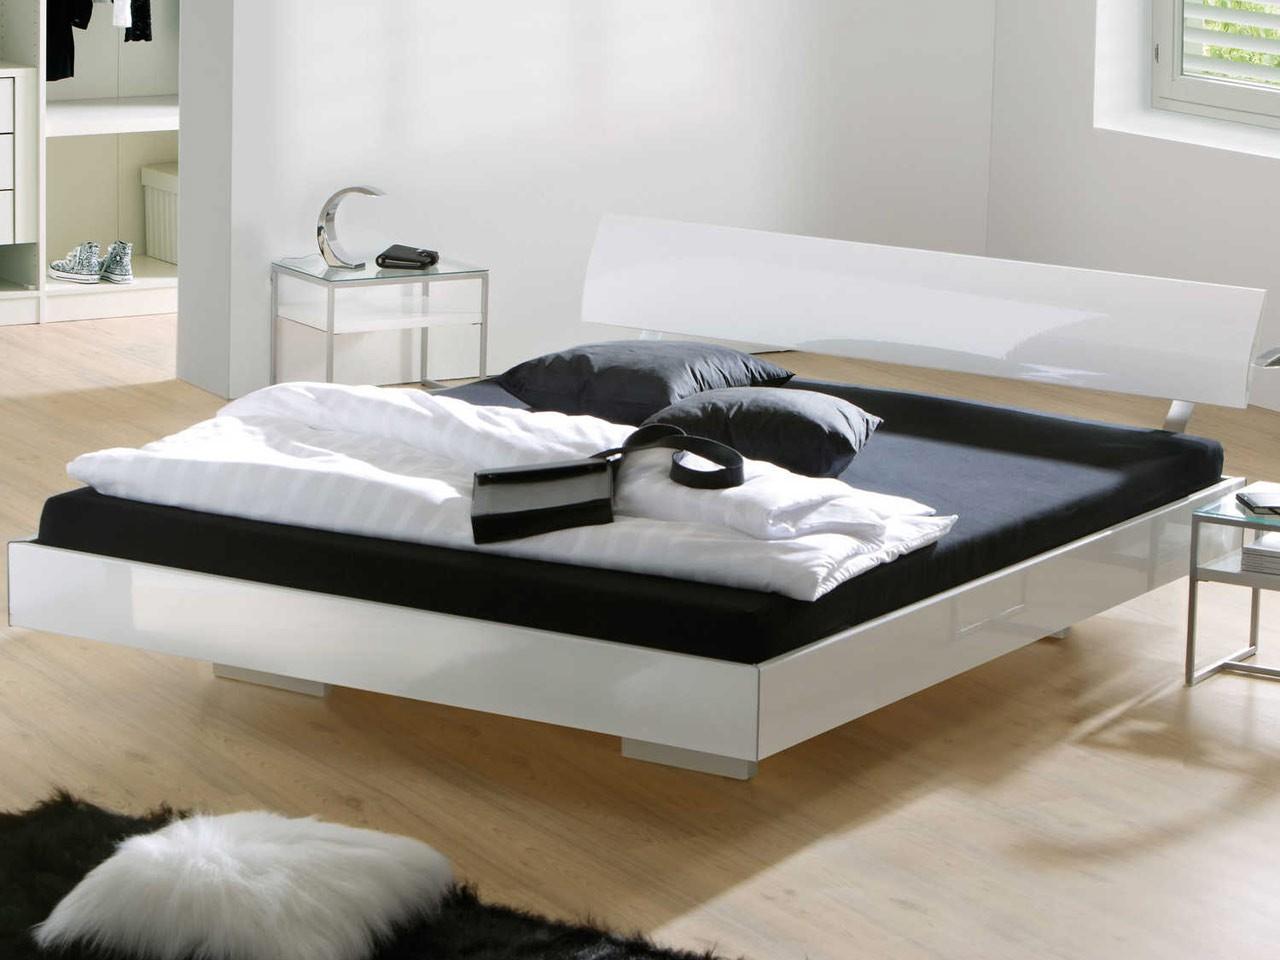 bett weiss 200x200 preis vergleich 2016. Black Bedroom Furniture Sets. Home Design Ideas